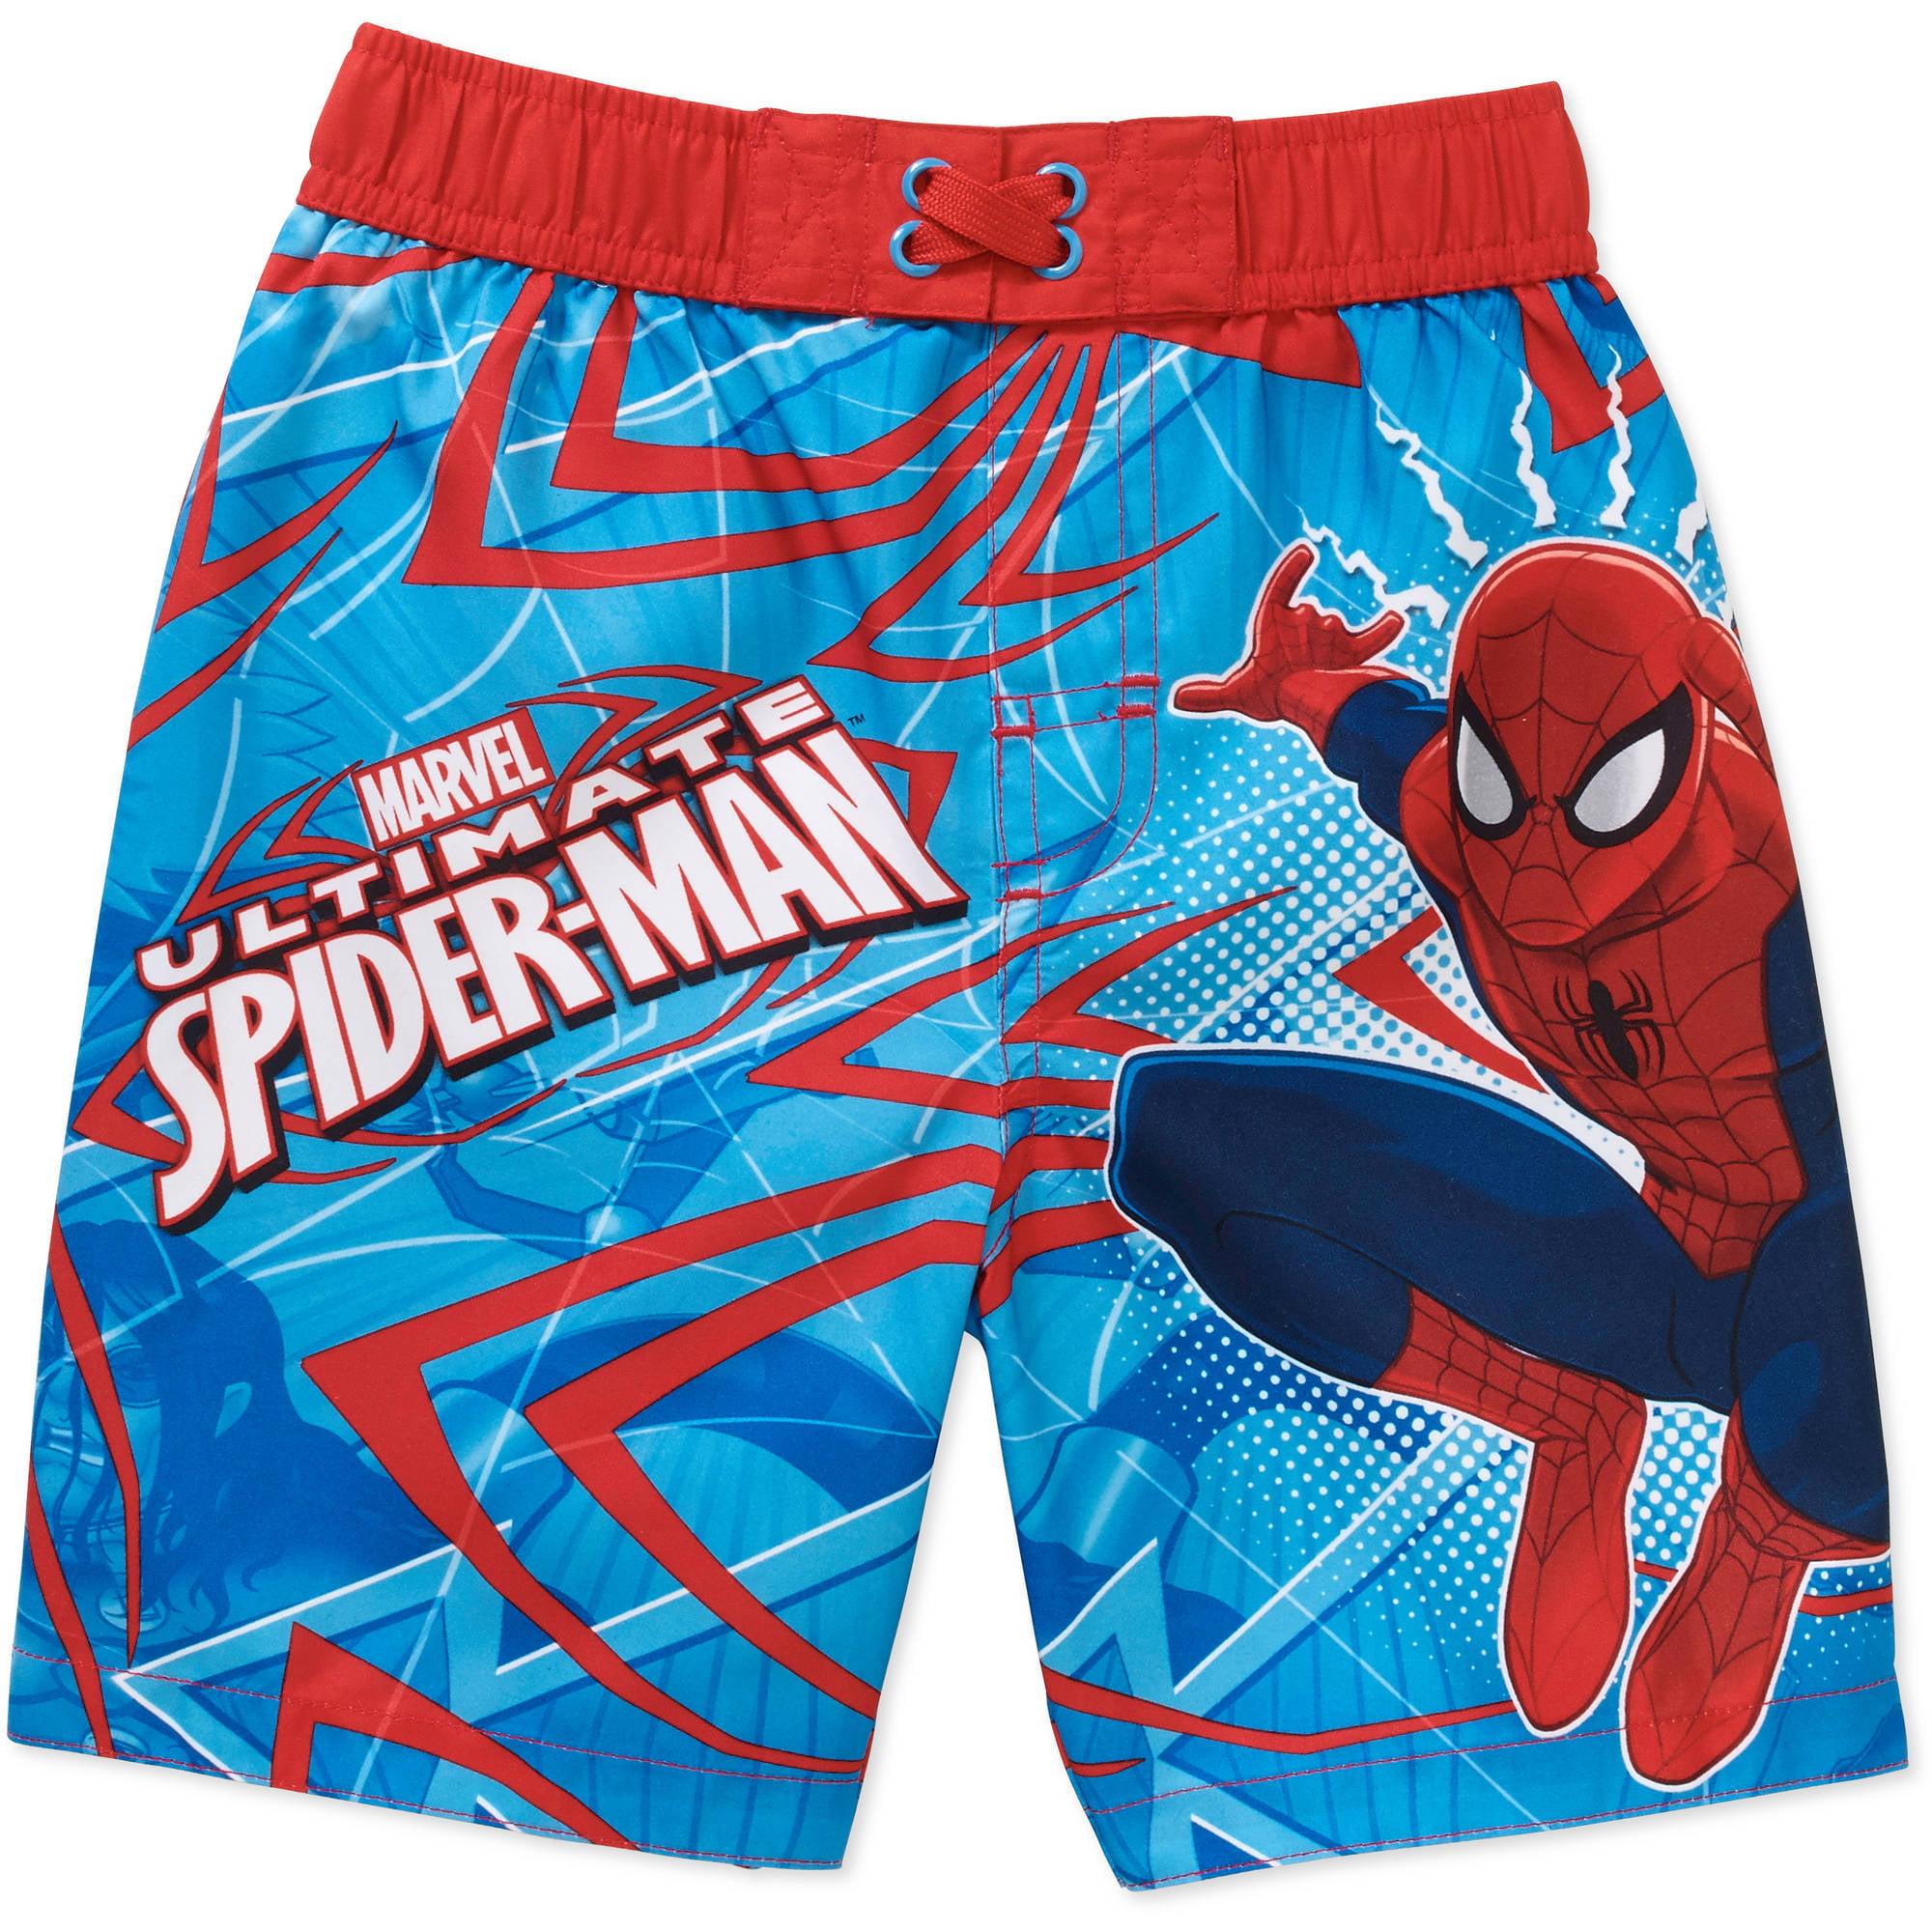 Spiderman Toddler Boy Swim Trunks 2631117sp